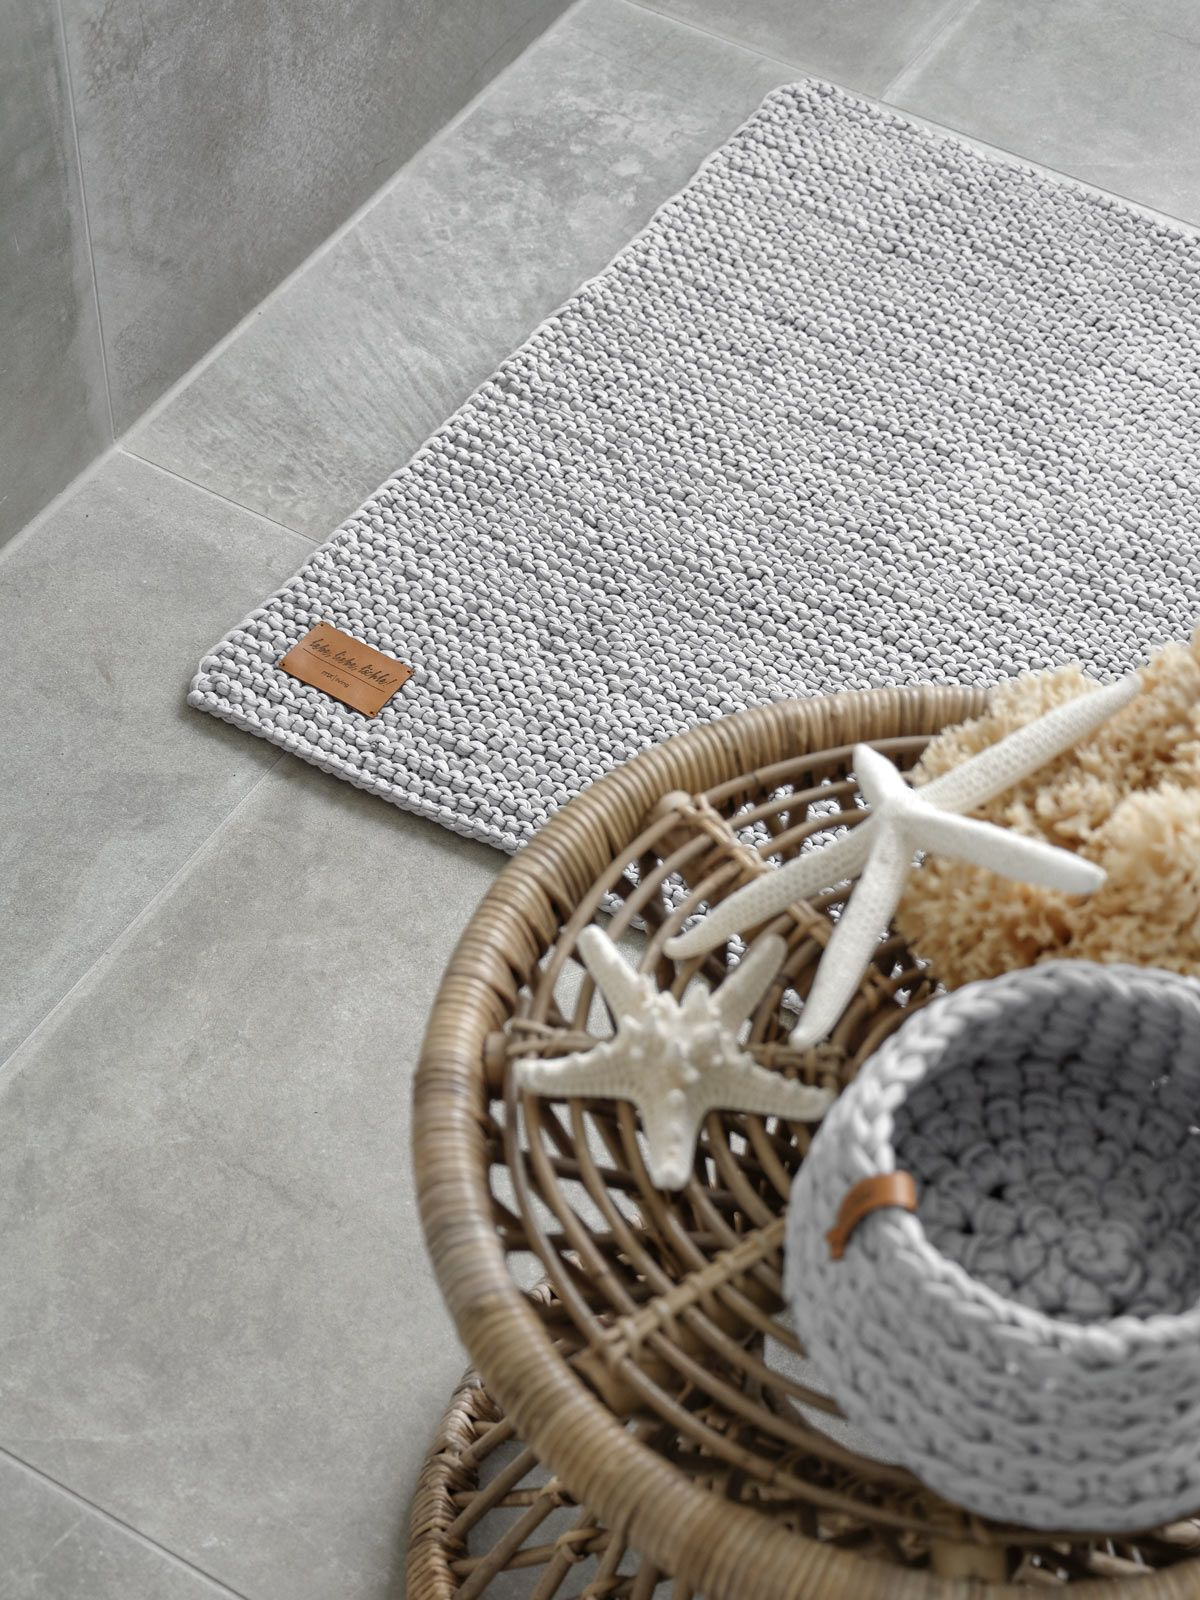 Diy Knit Crochet Pinterest Knitting Knit Crochet And Crochet